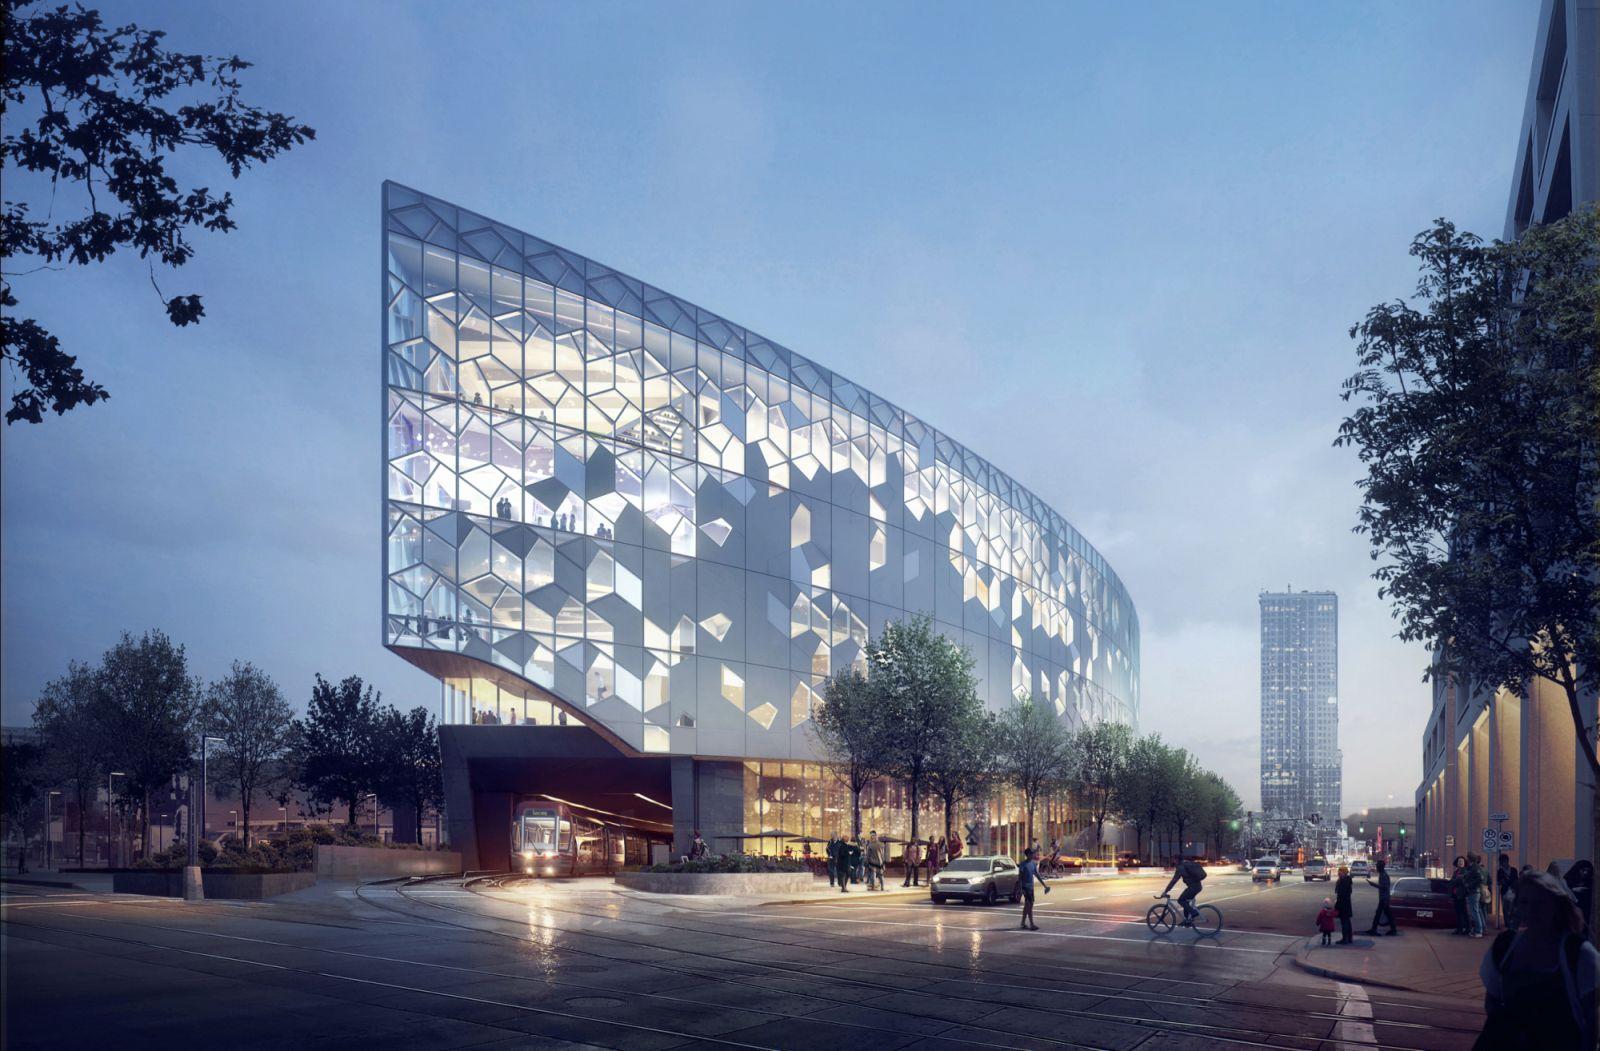 Snøhetta named Wall Street Journal Magazine's 2016 Architecture Innovator of the Year